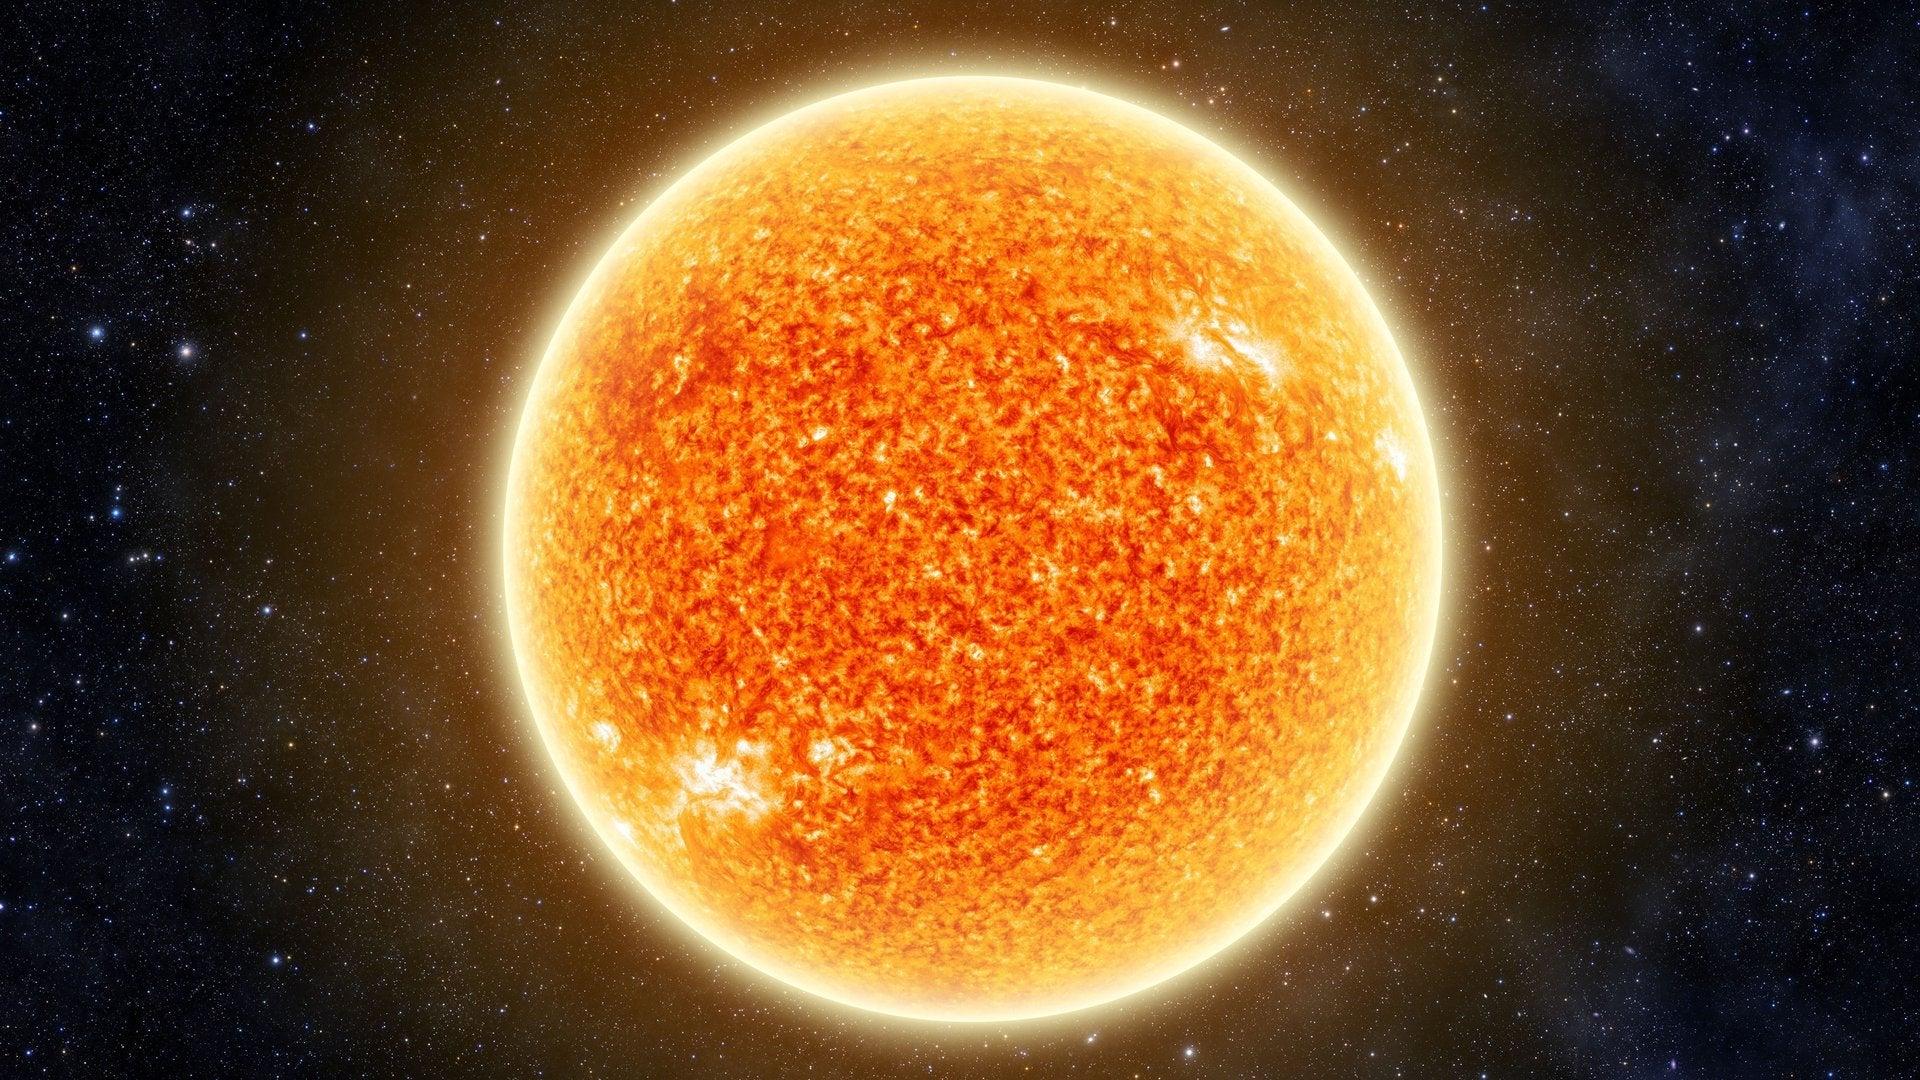 NASA's Mission to the Sun: Parker Solar Probe